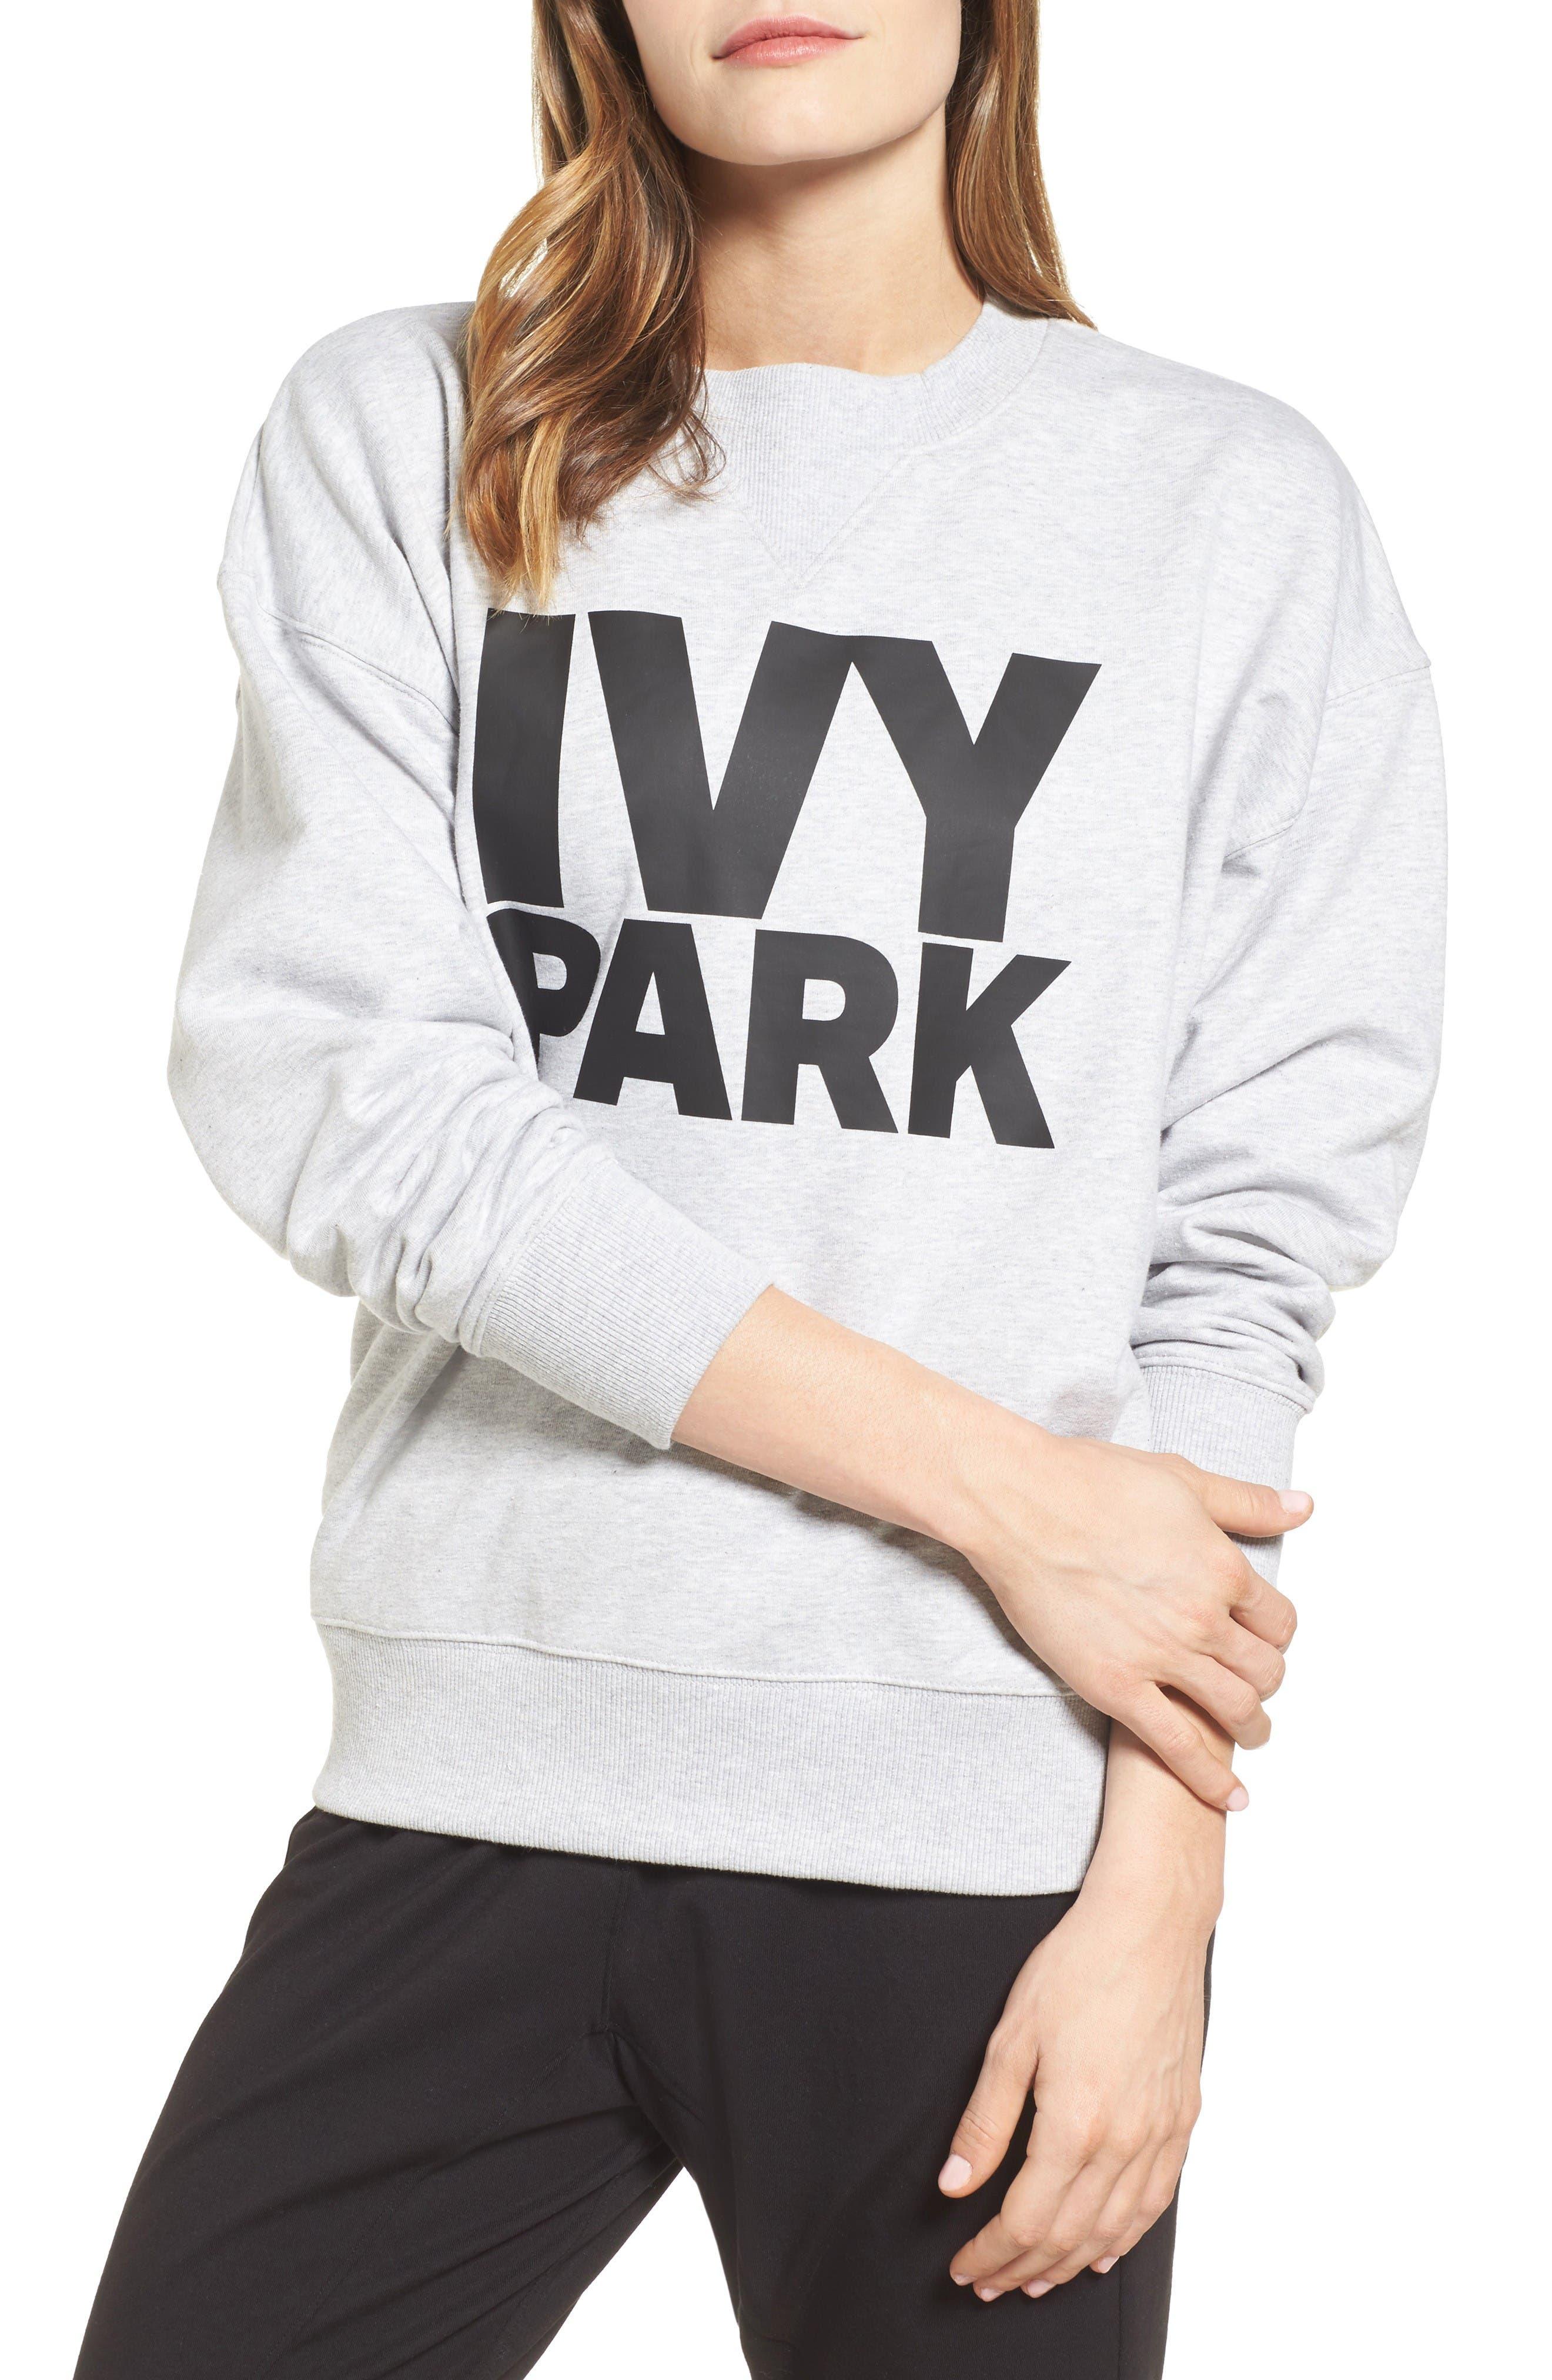 Main Image - IVY PARK® Logo Sweatshirt